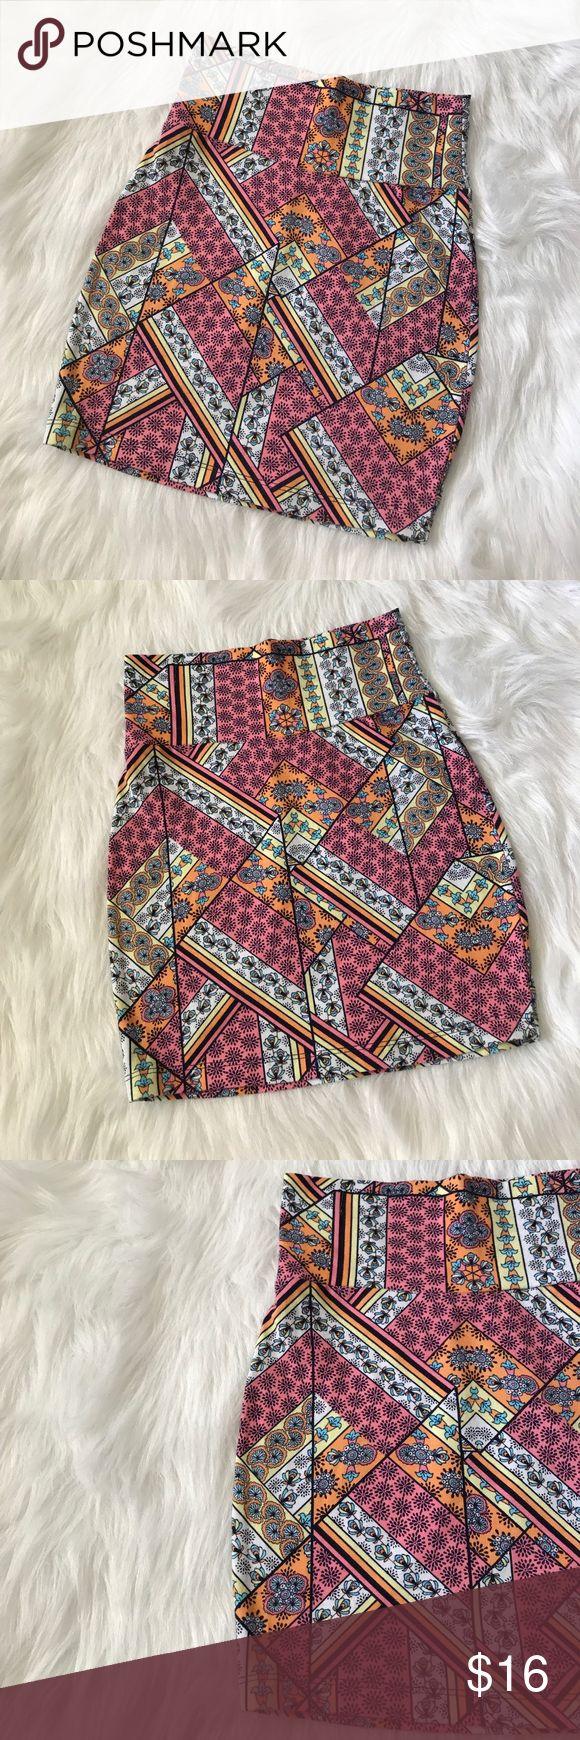 Aztec pink mini skirt  Charlotte Ruse sexy mini skirt ! Size xs Charlotte Russe Skirts Mini